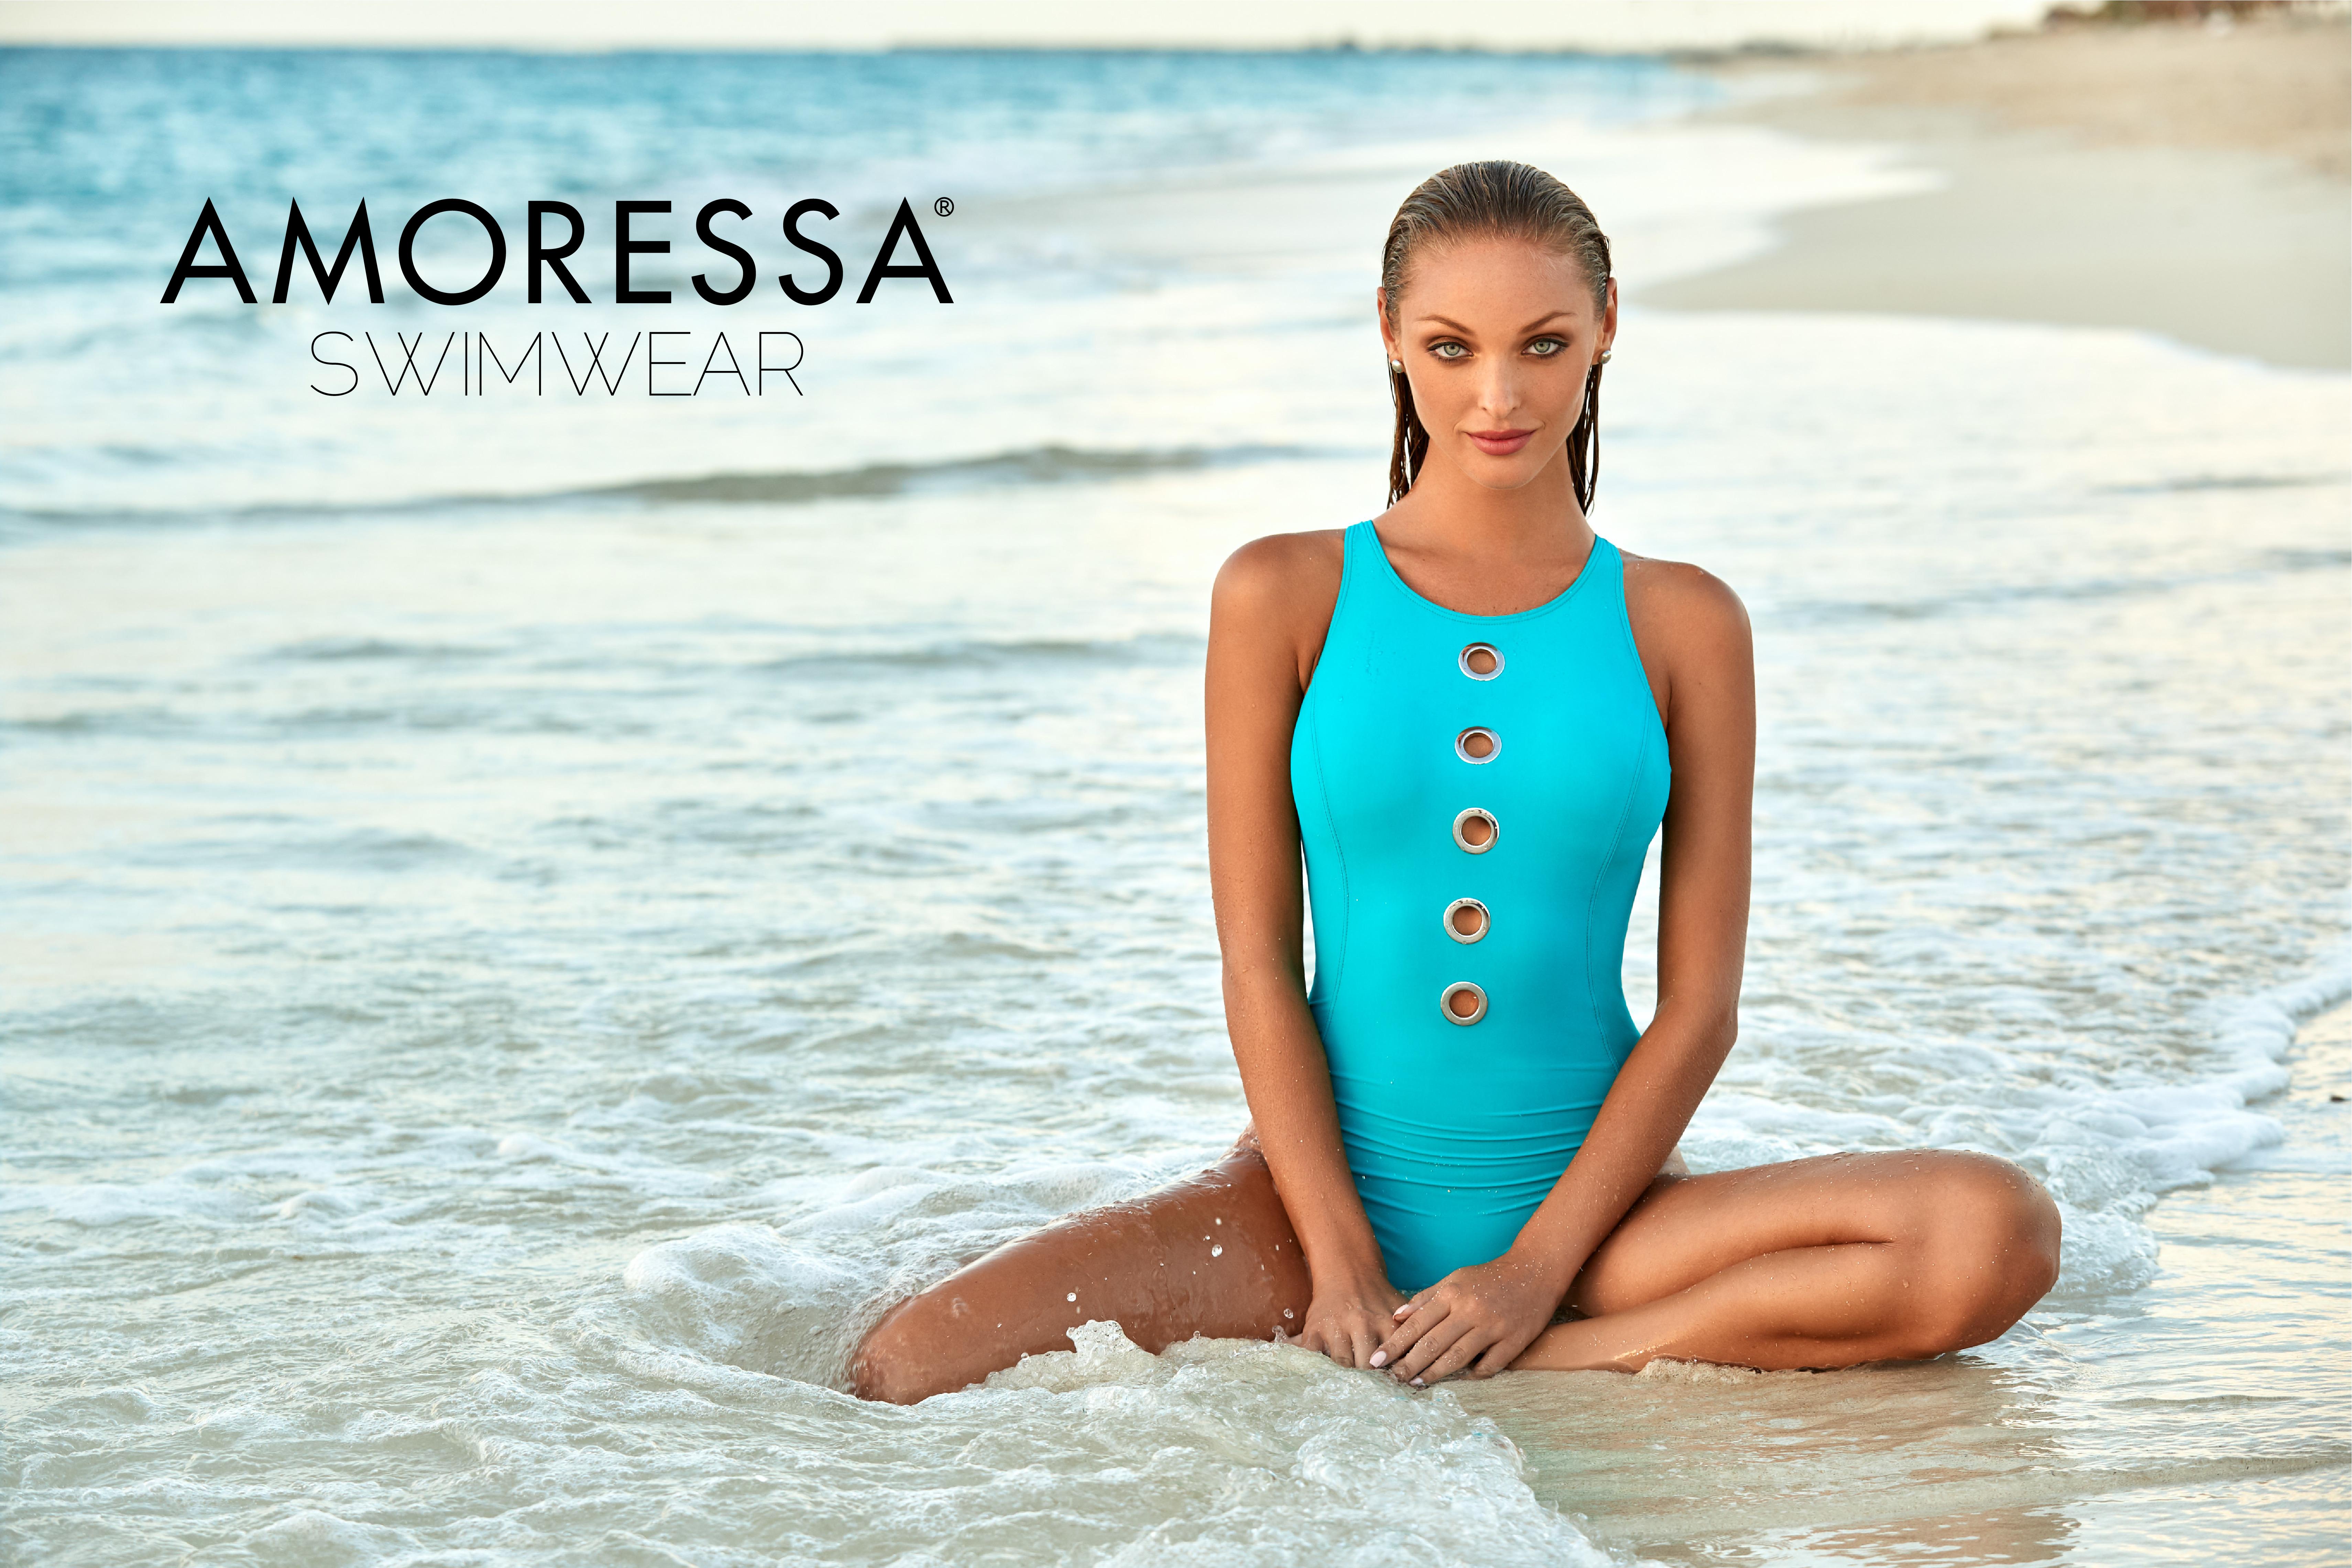 Amoressa Swimwear